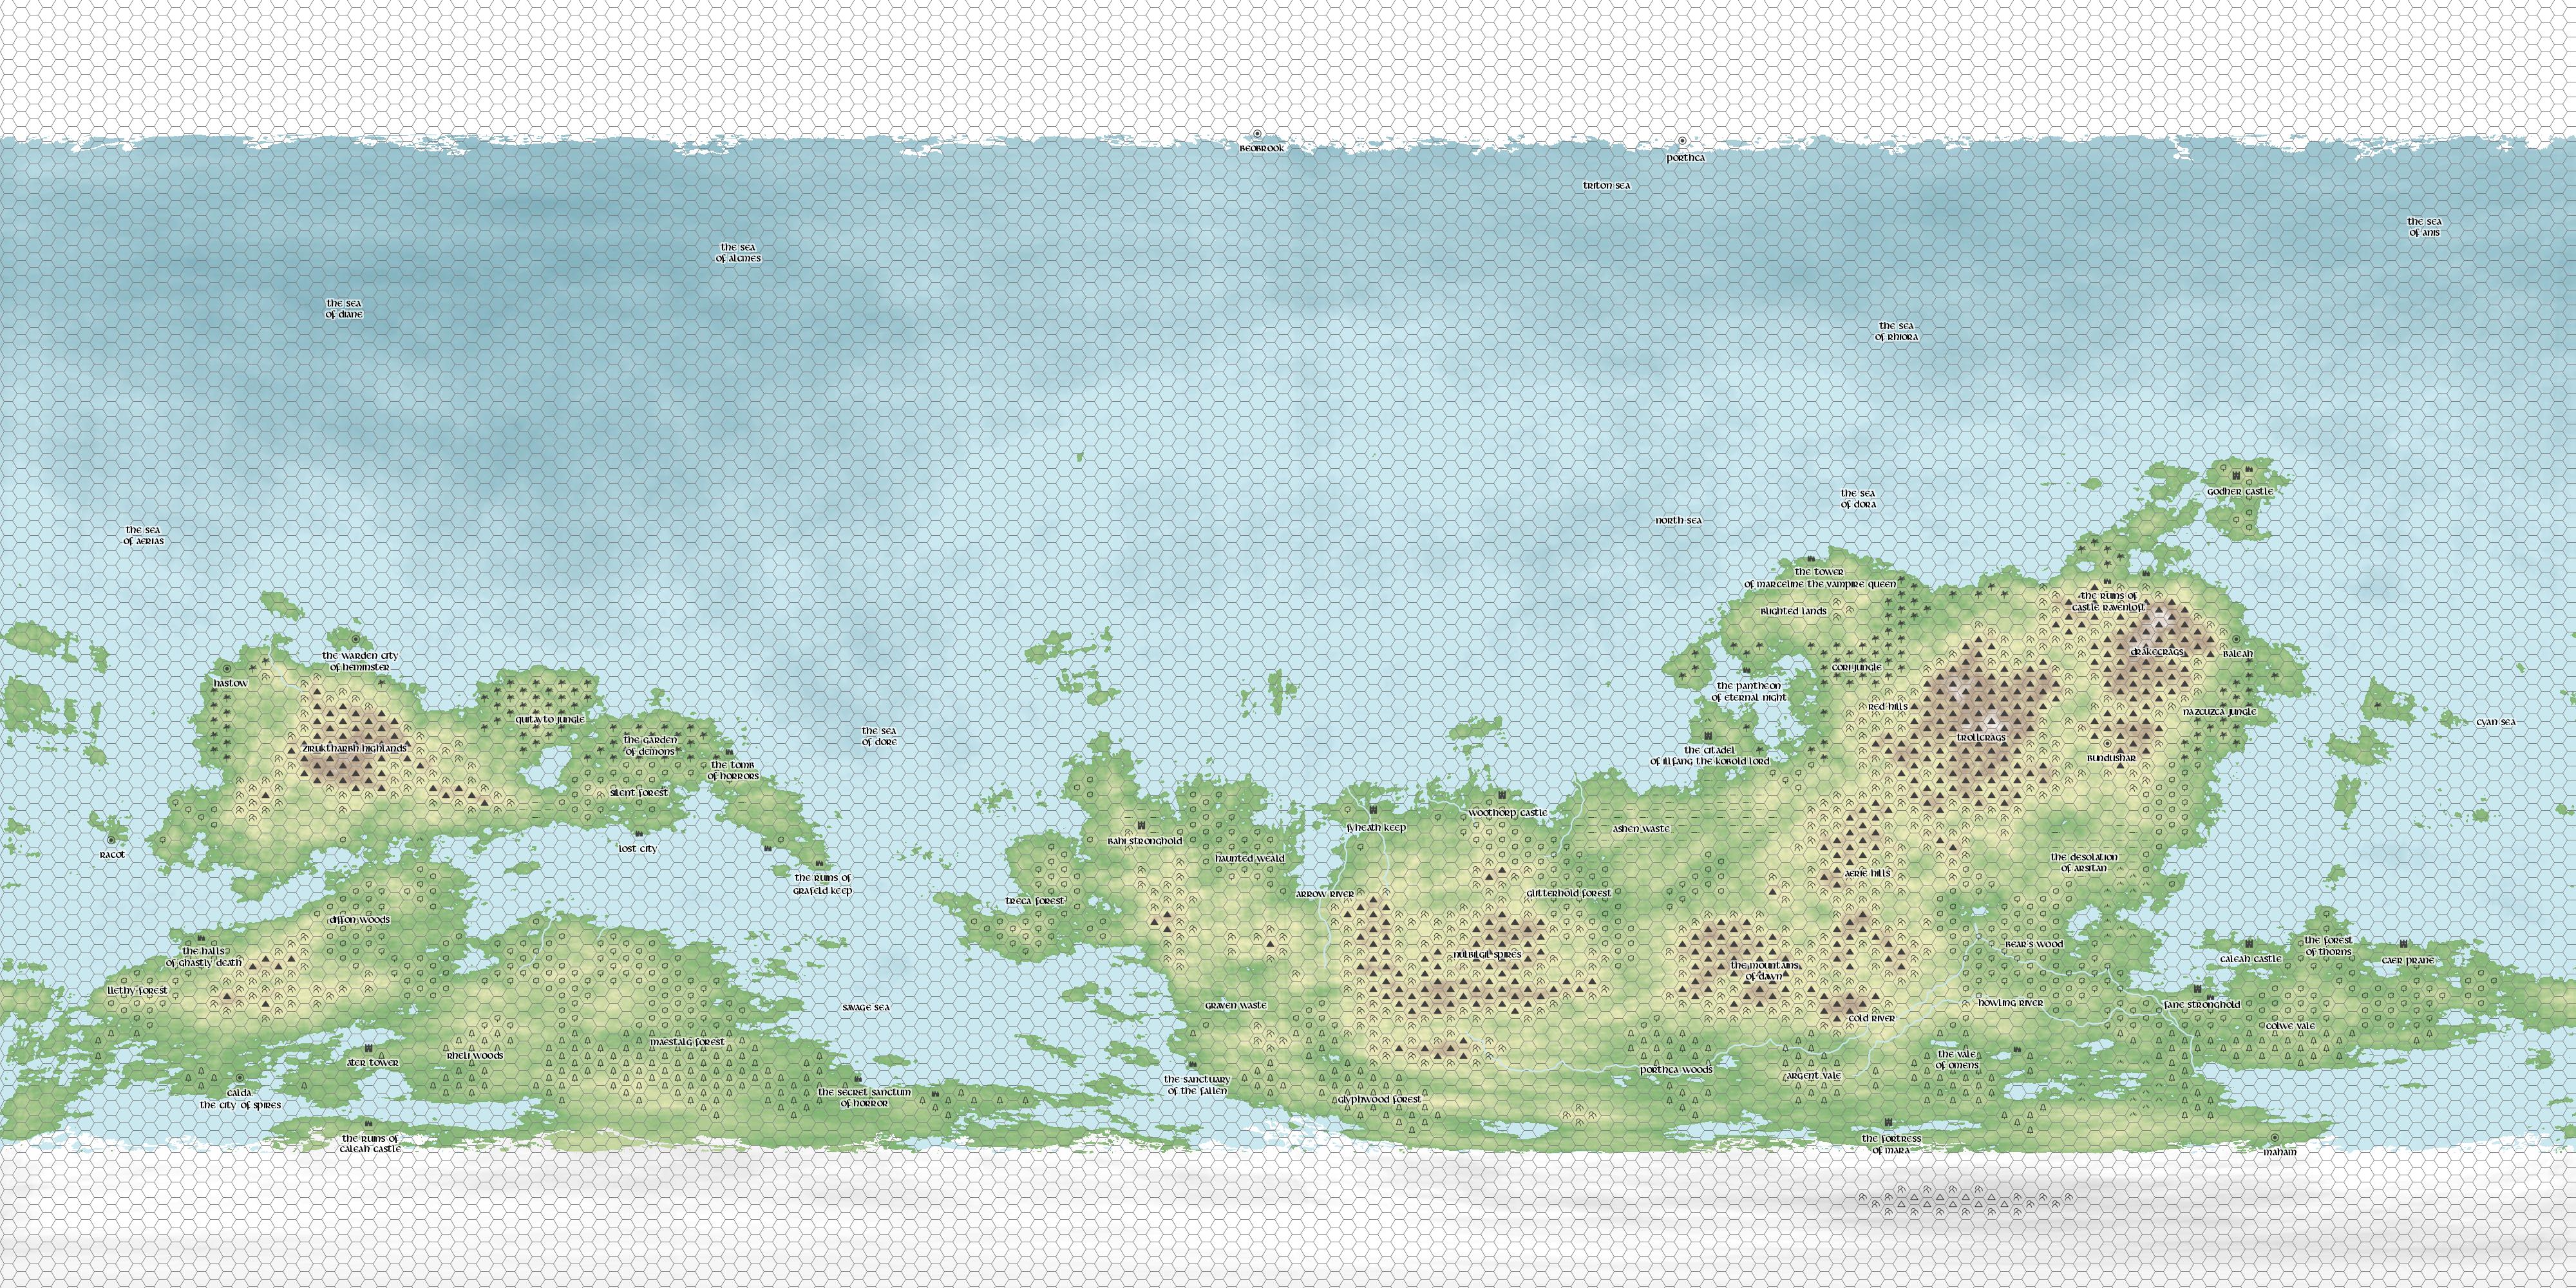 Donjon gionevreg random map generator landscape design donjon gionevreg random map generator gumiabroncs Image collections